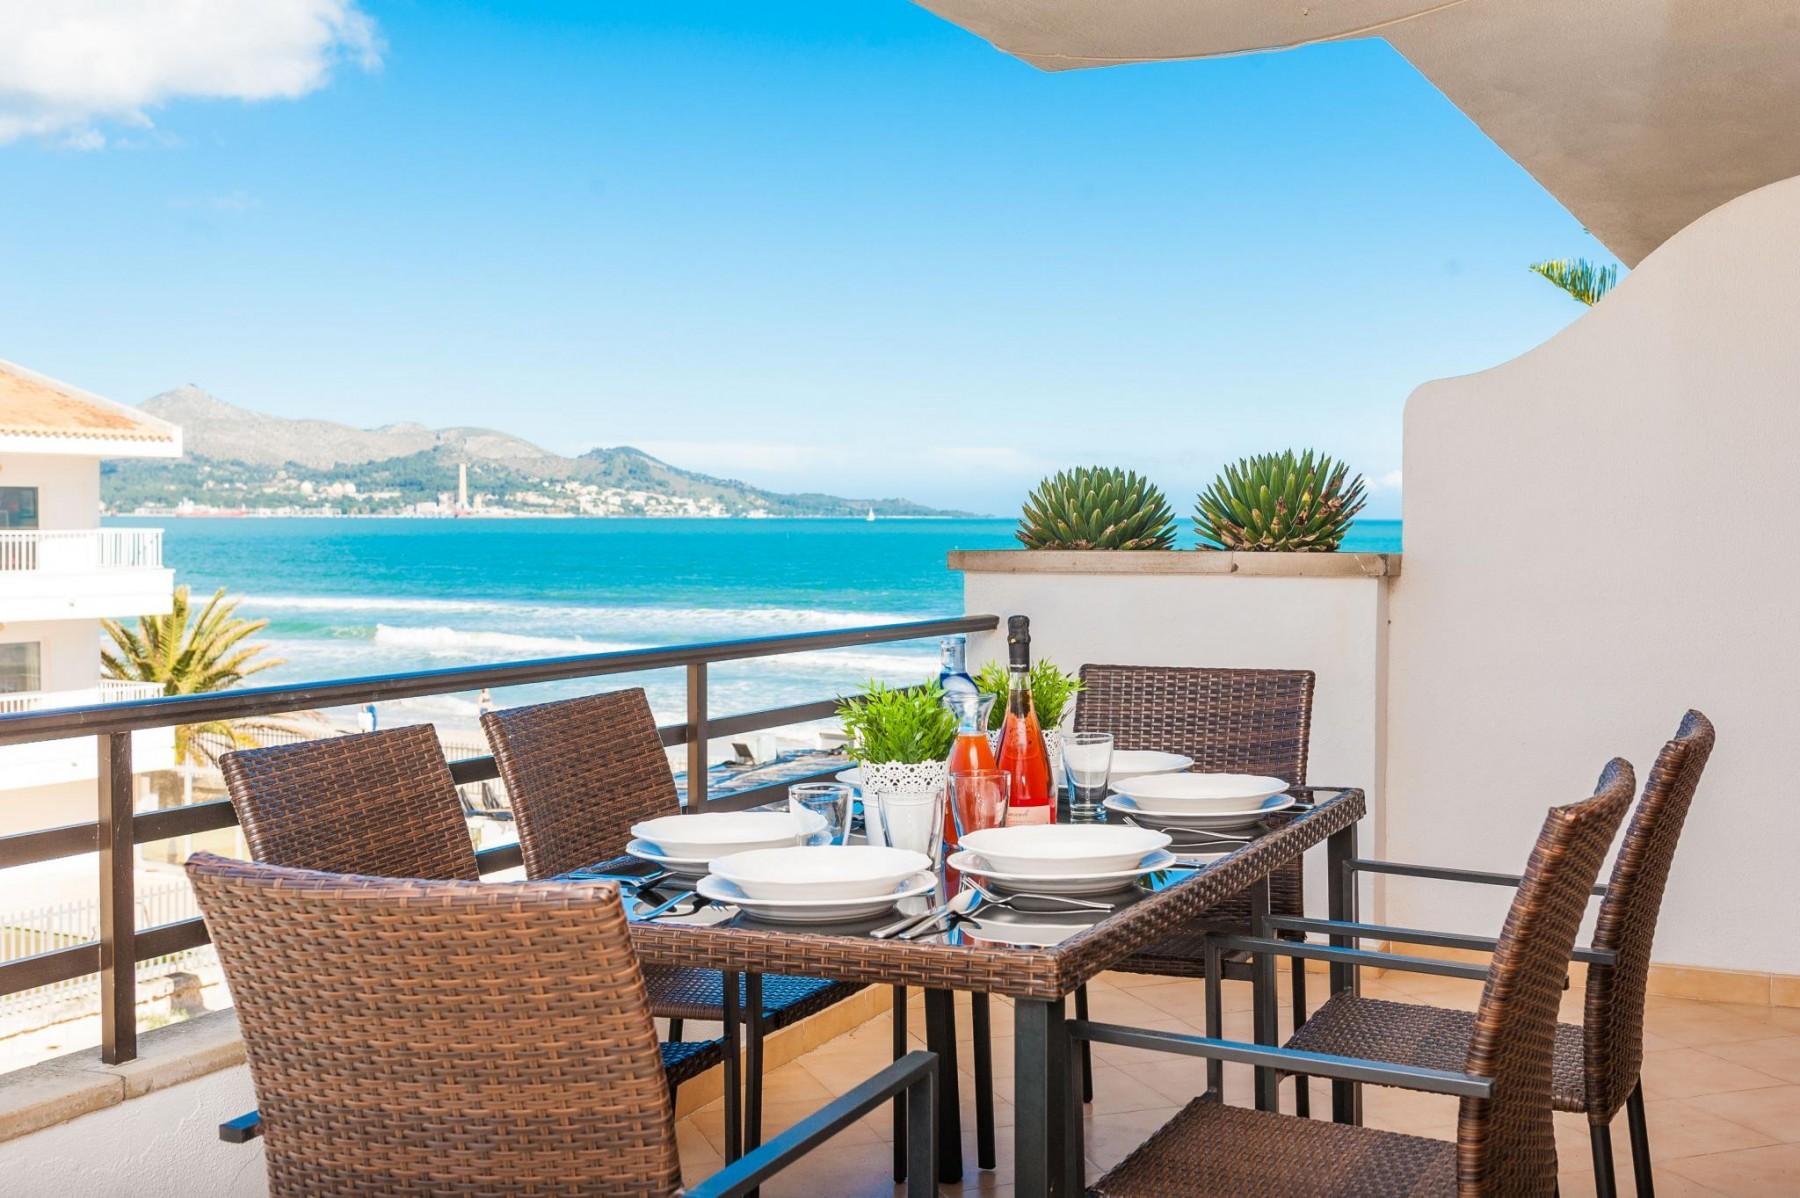 BELLAVISTA for 6 guests in Alcudia, Spanien